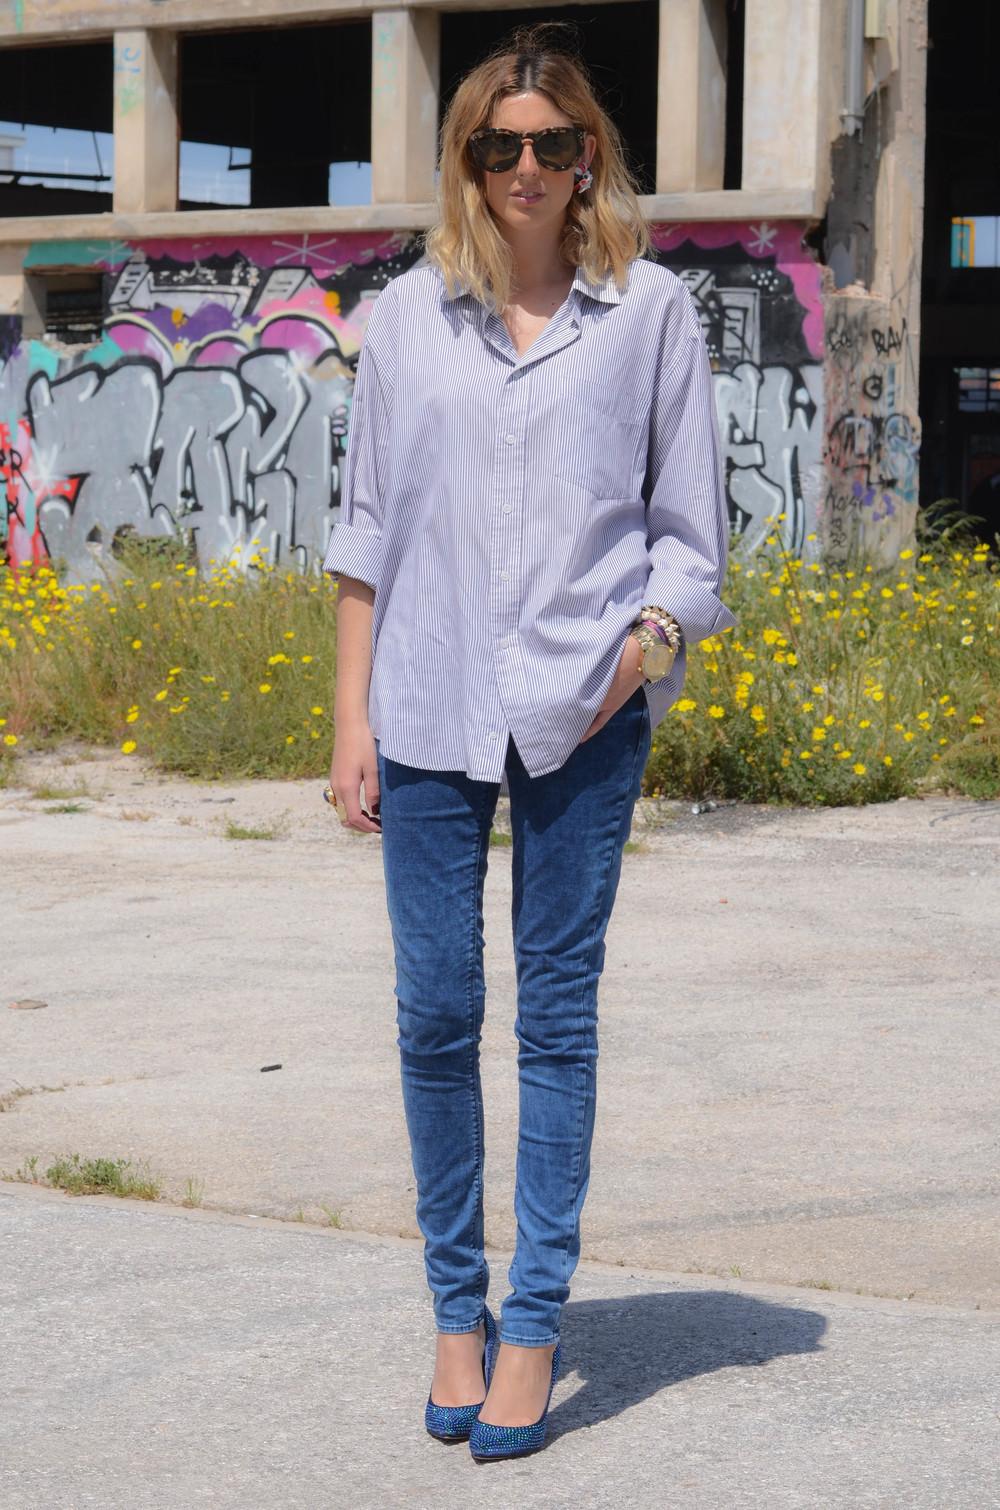 big_shirt_skinny_jeans8.jpg